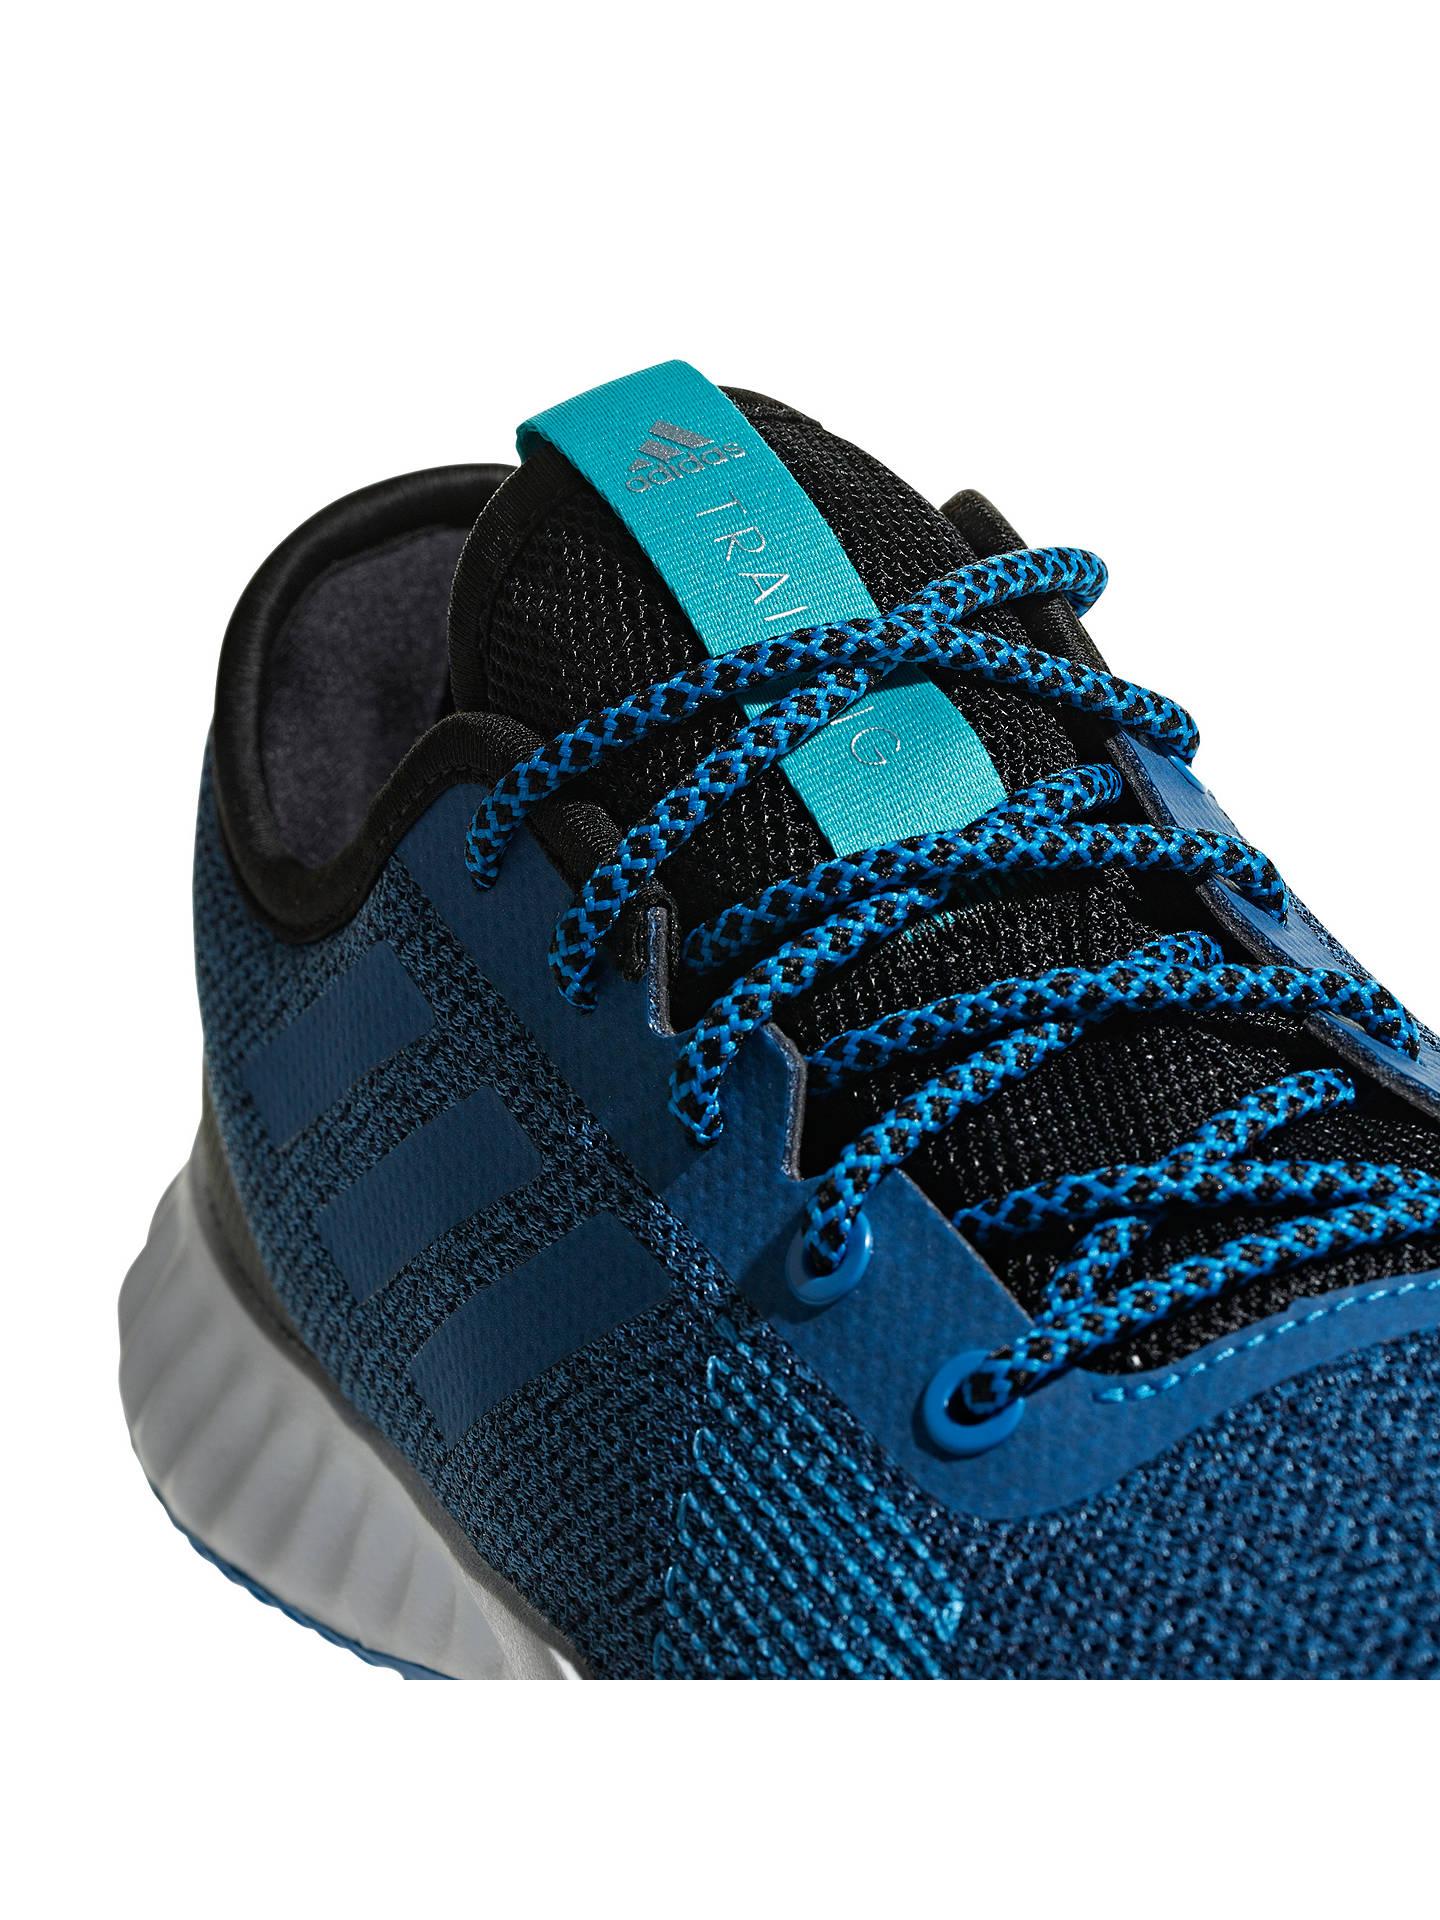 adidas CrazyTrain LT Men's Training Shoes, Bright Blue at